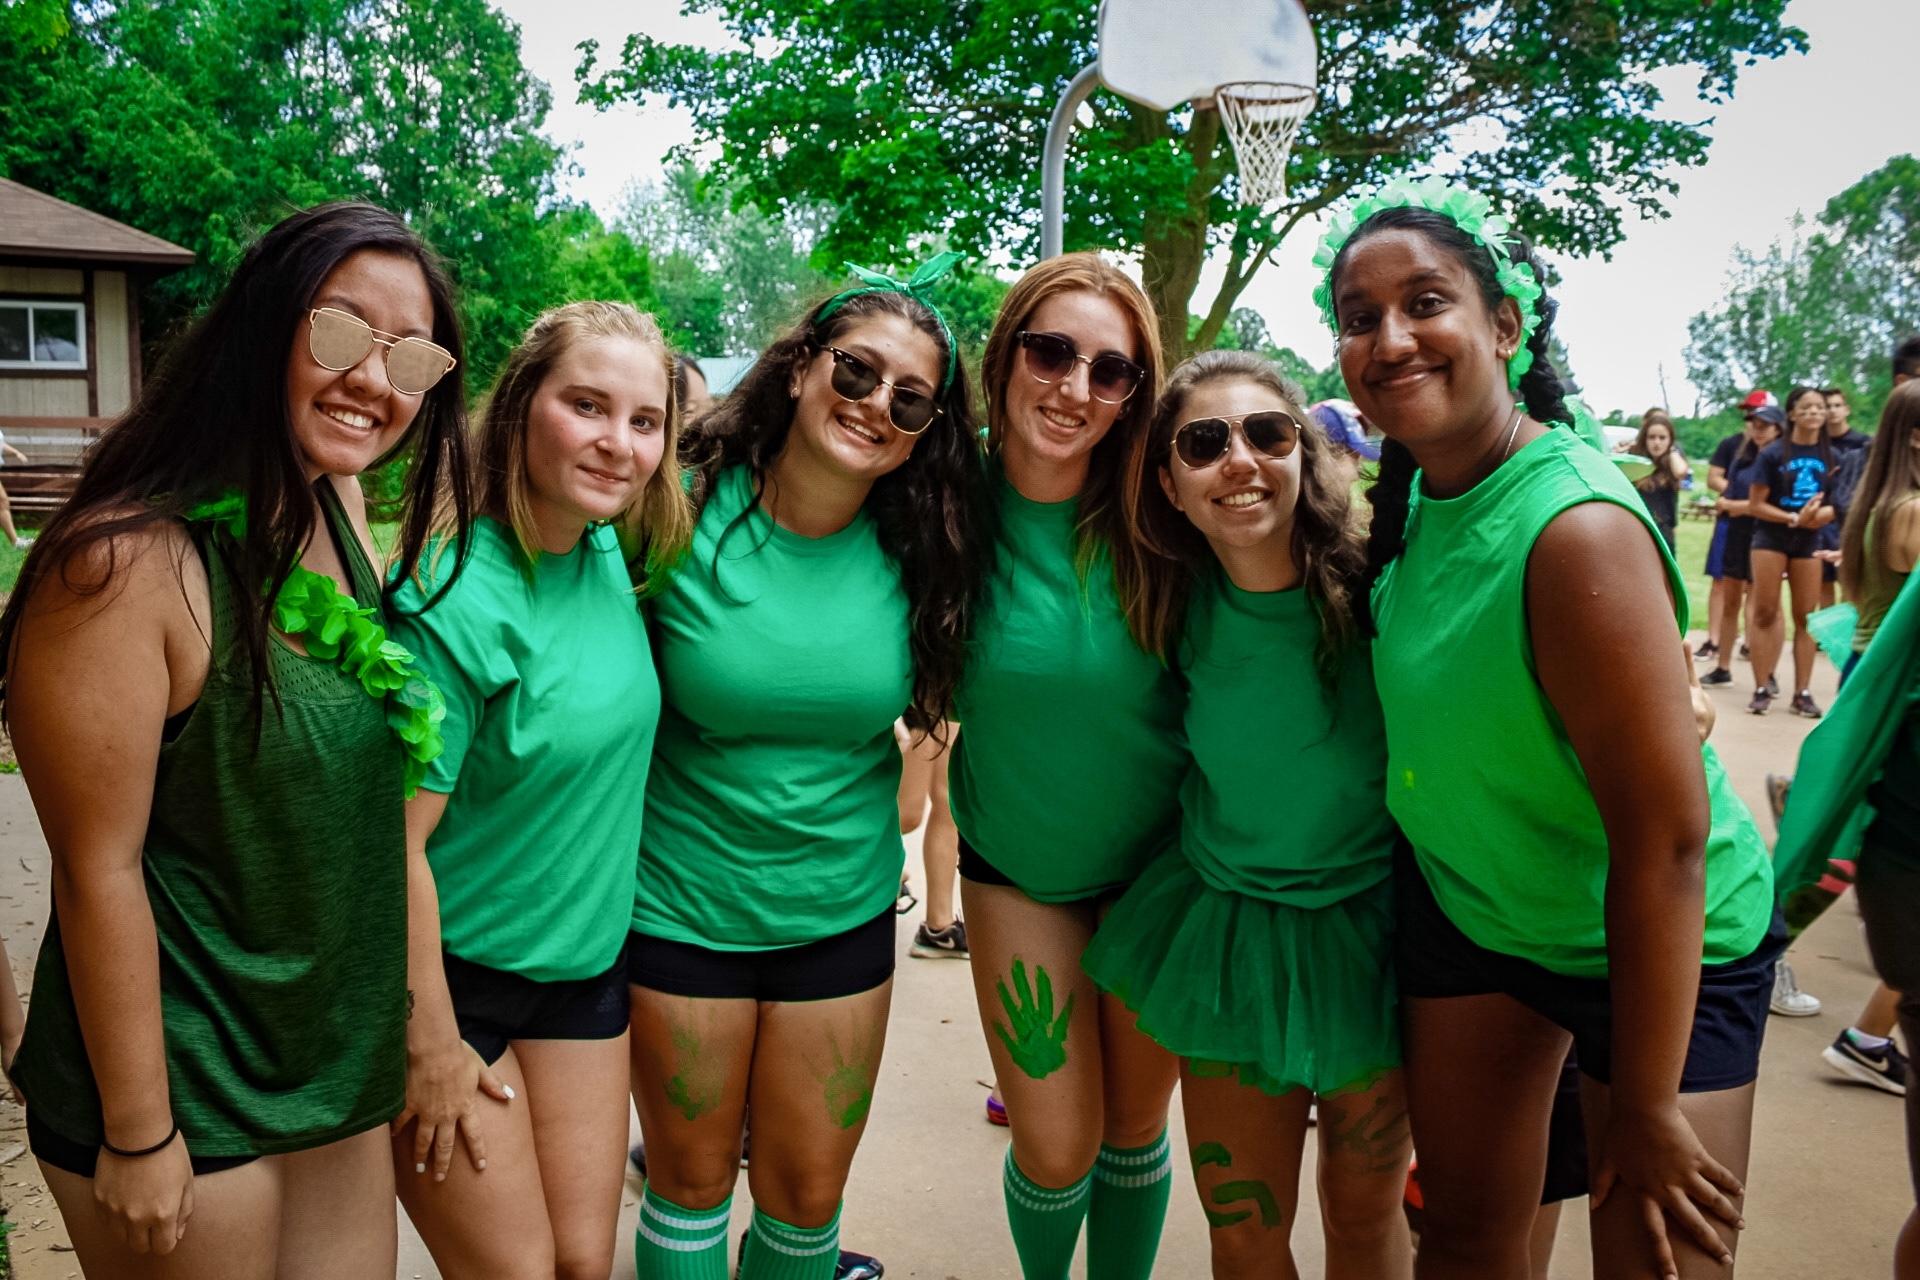 female camp staff all wearing green